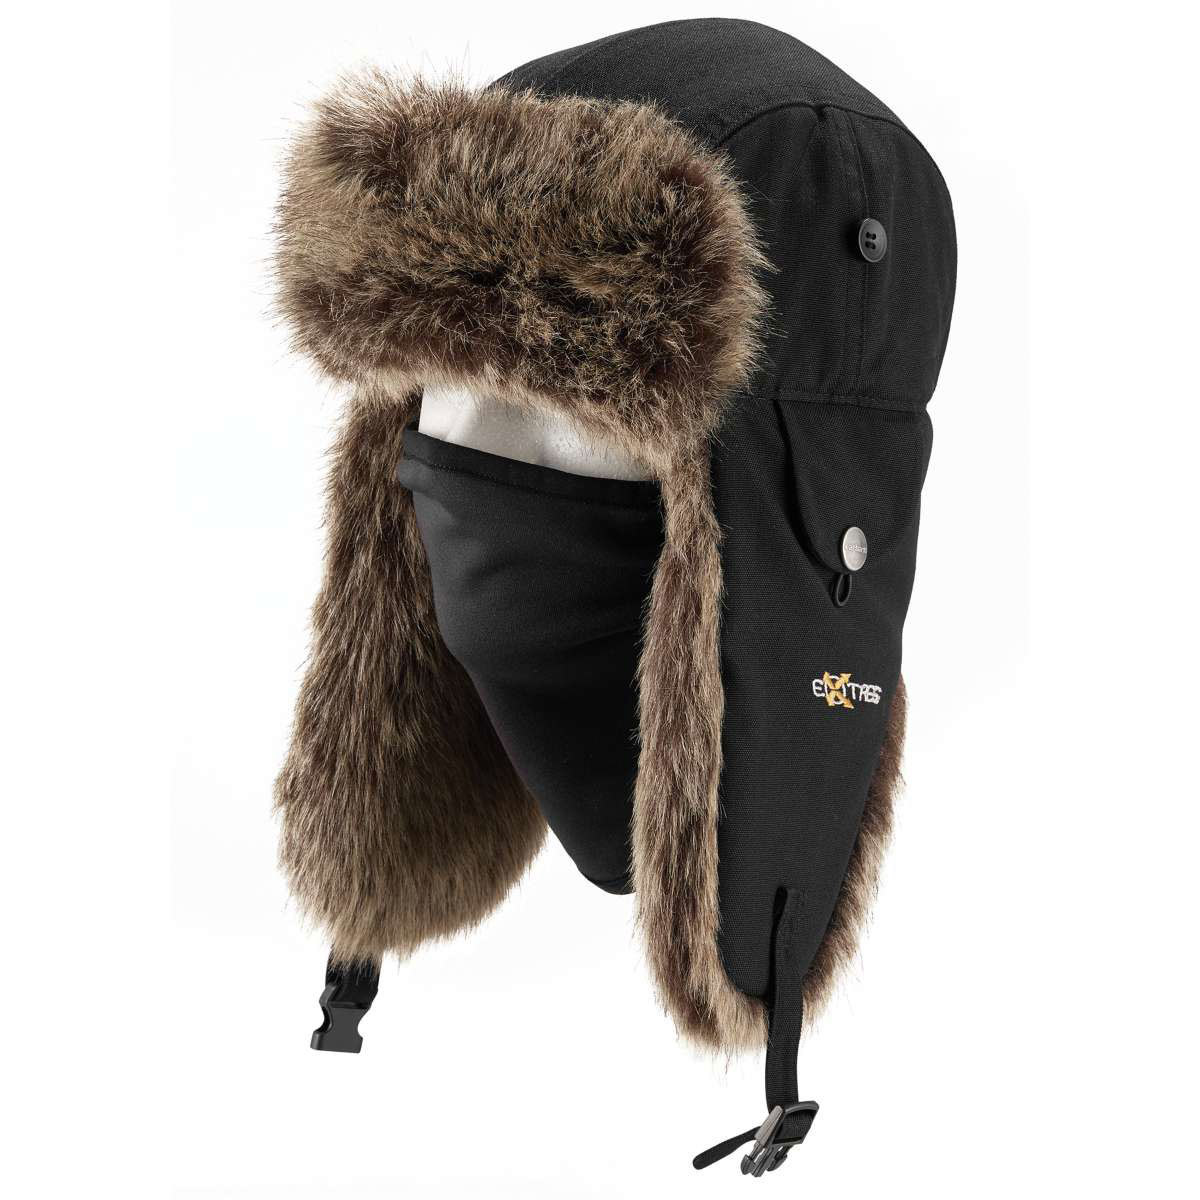 Carhartt Men's Trapper Hat - Black, L/XL